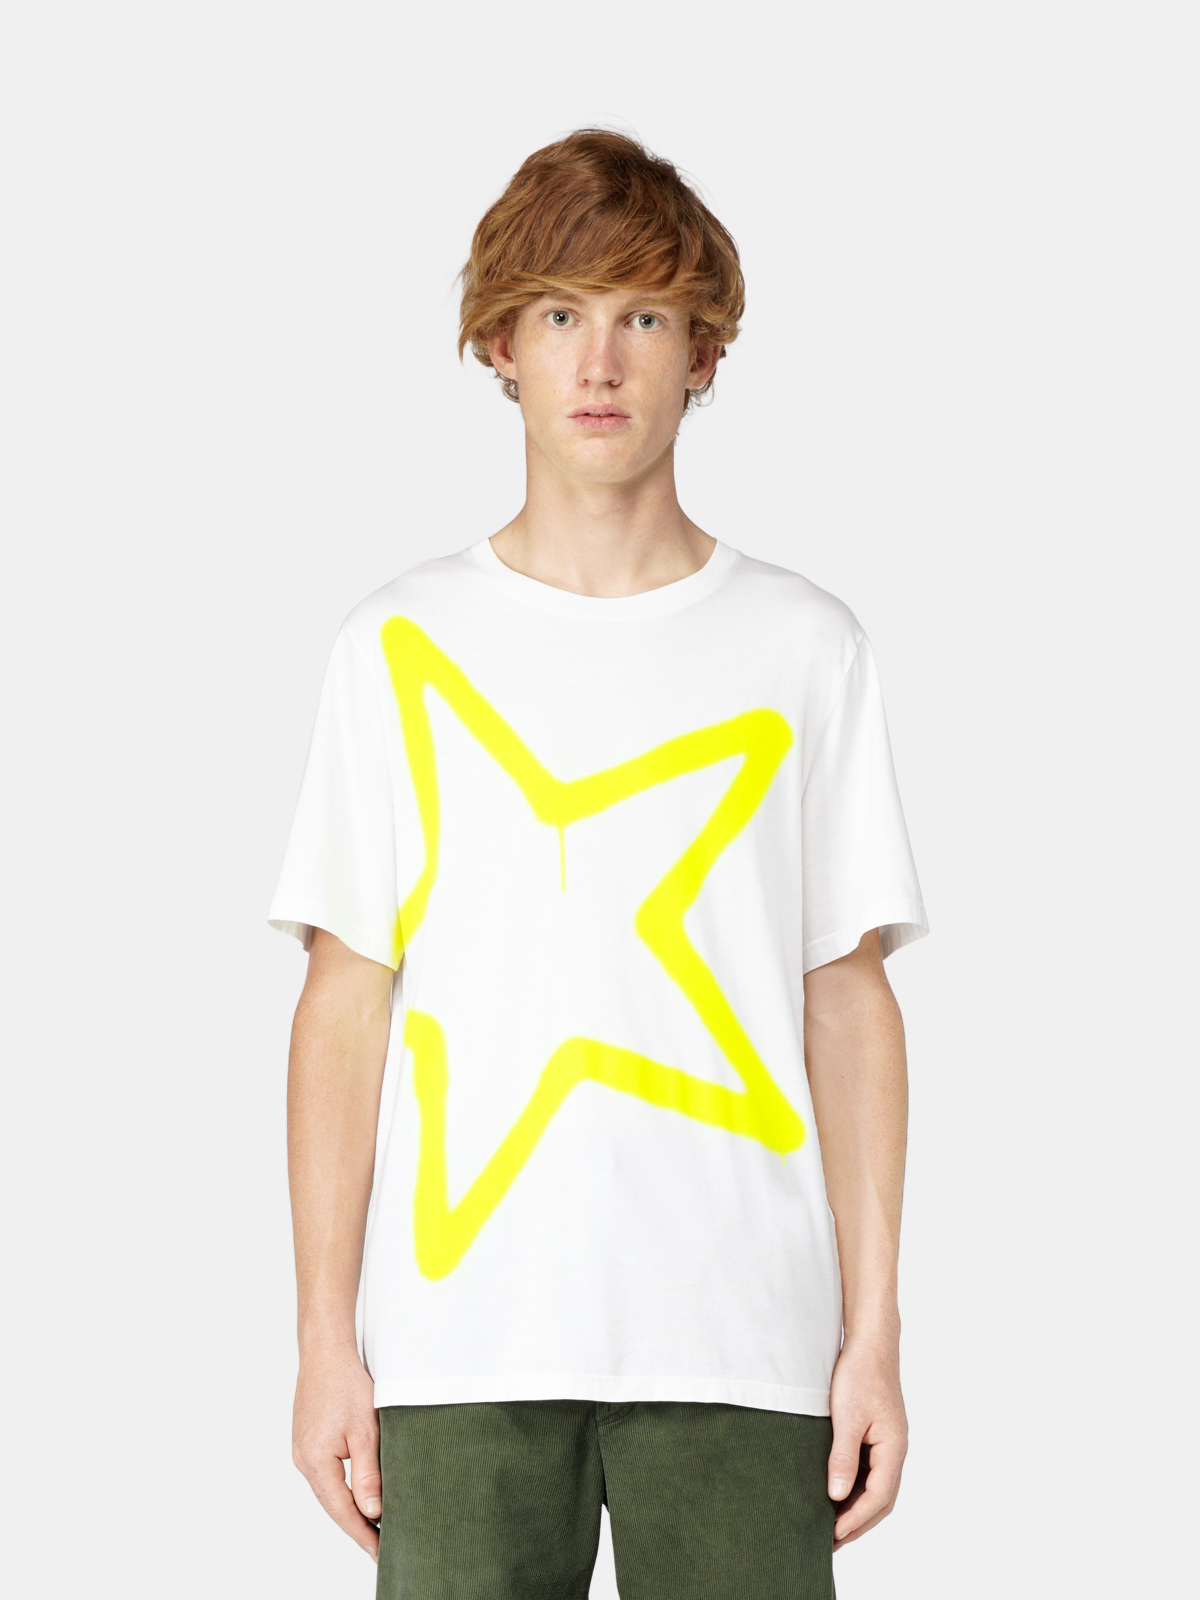 Golden Goose - T-shirt Adamo con stampa maxi stella in